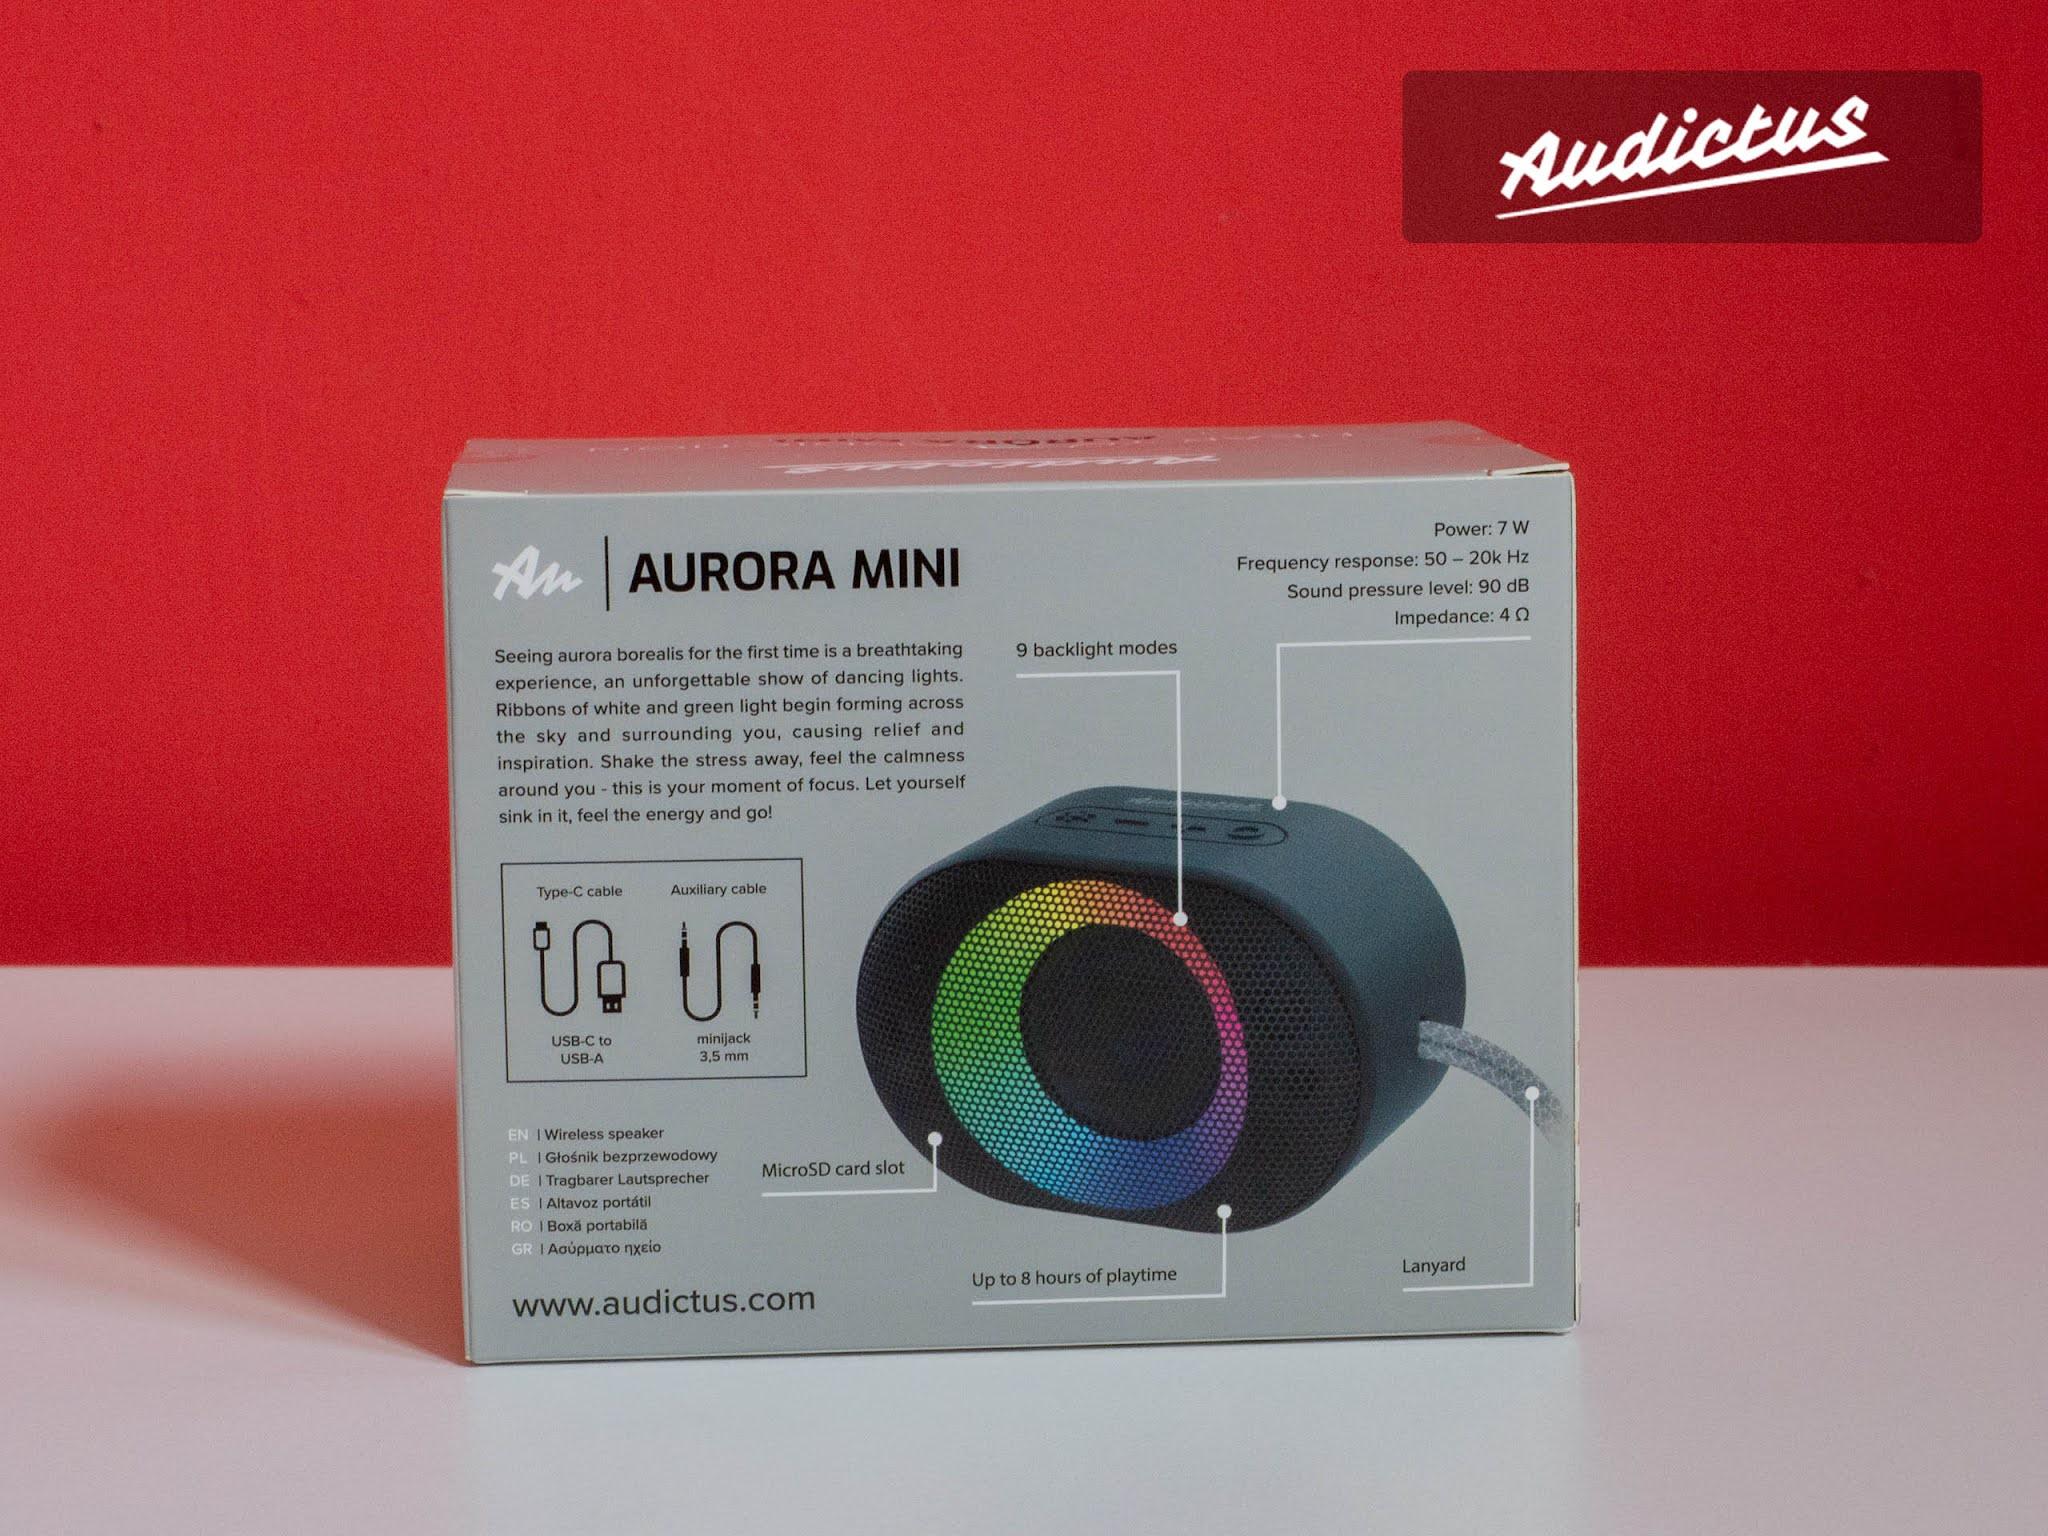 Audictus Aurora Mini tył pudełka